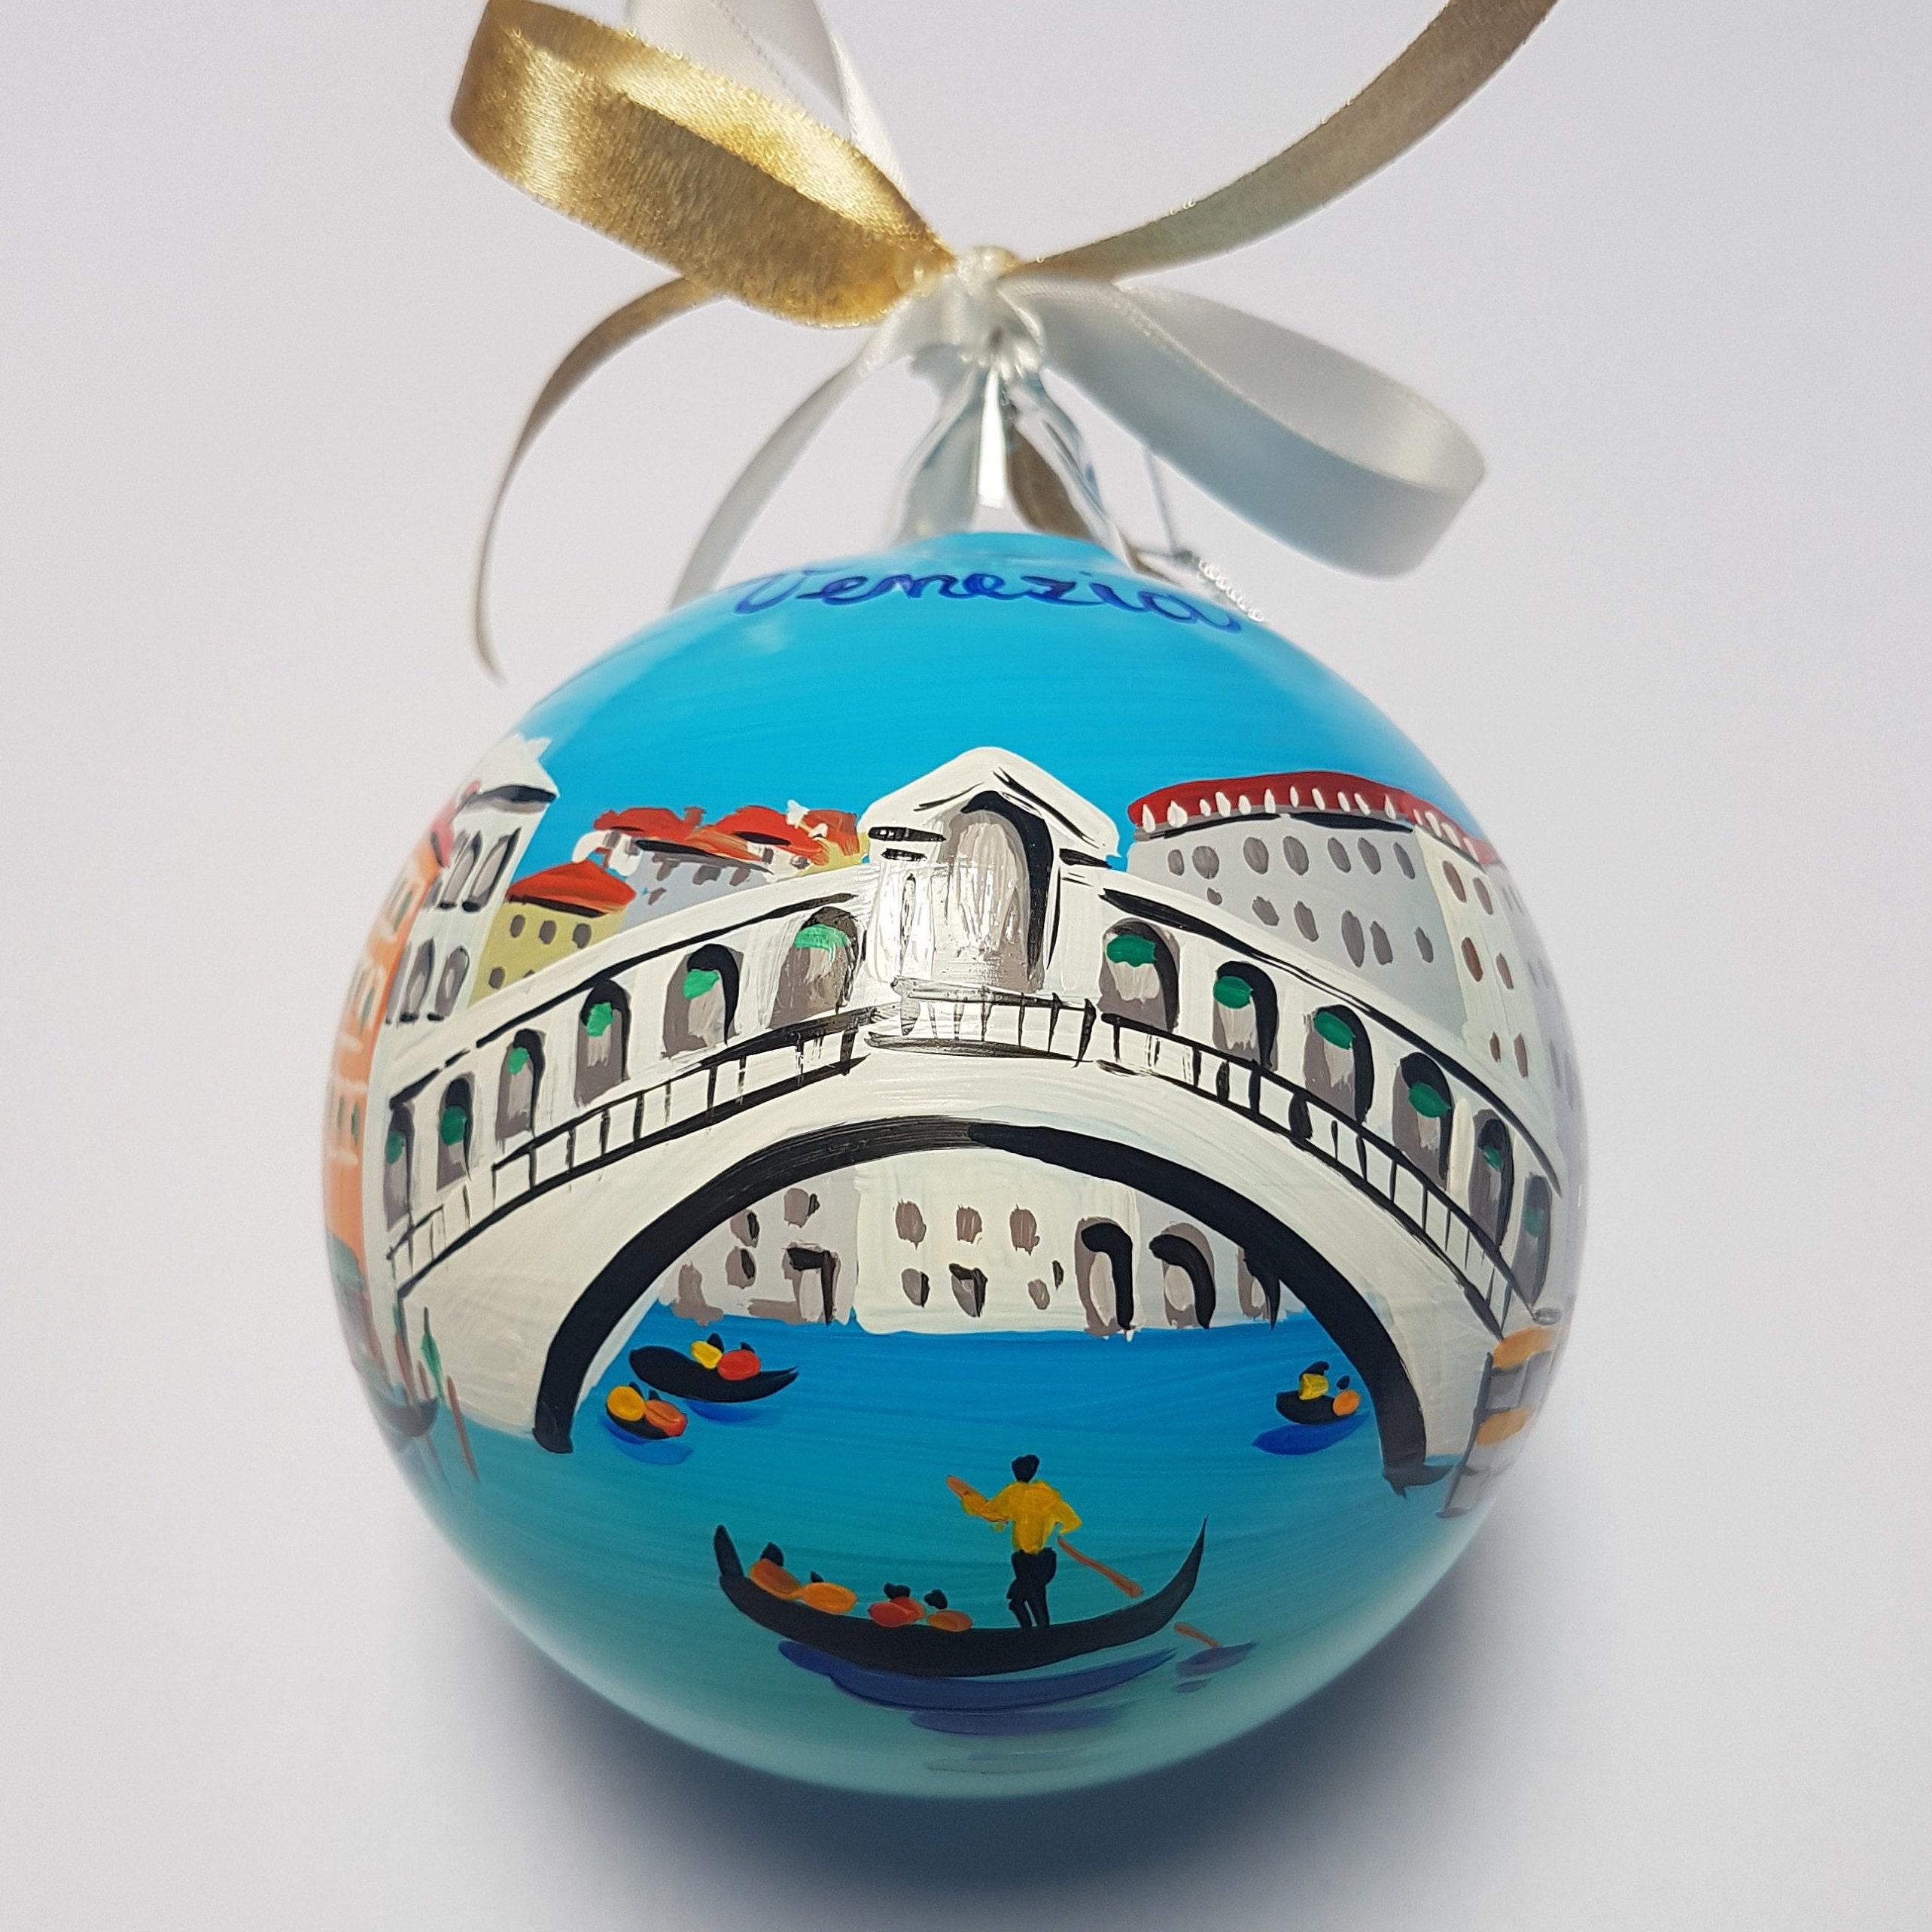 Dipingere Sassi Per Natale ornamenti personalizzati made in italy by ferrarisoniart on etsy